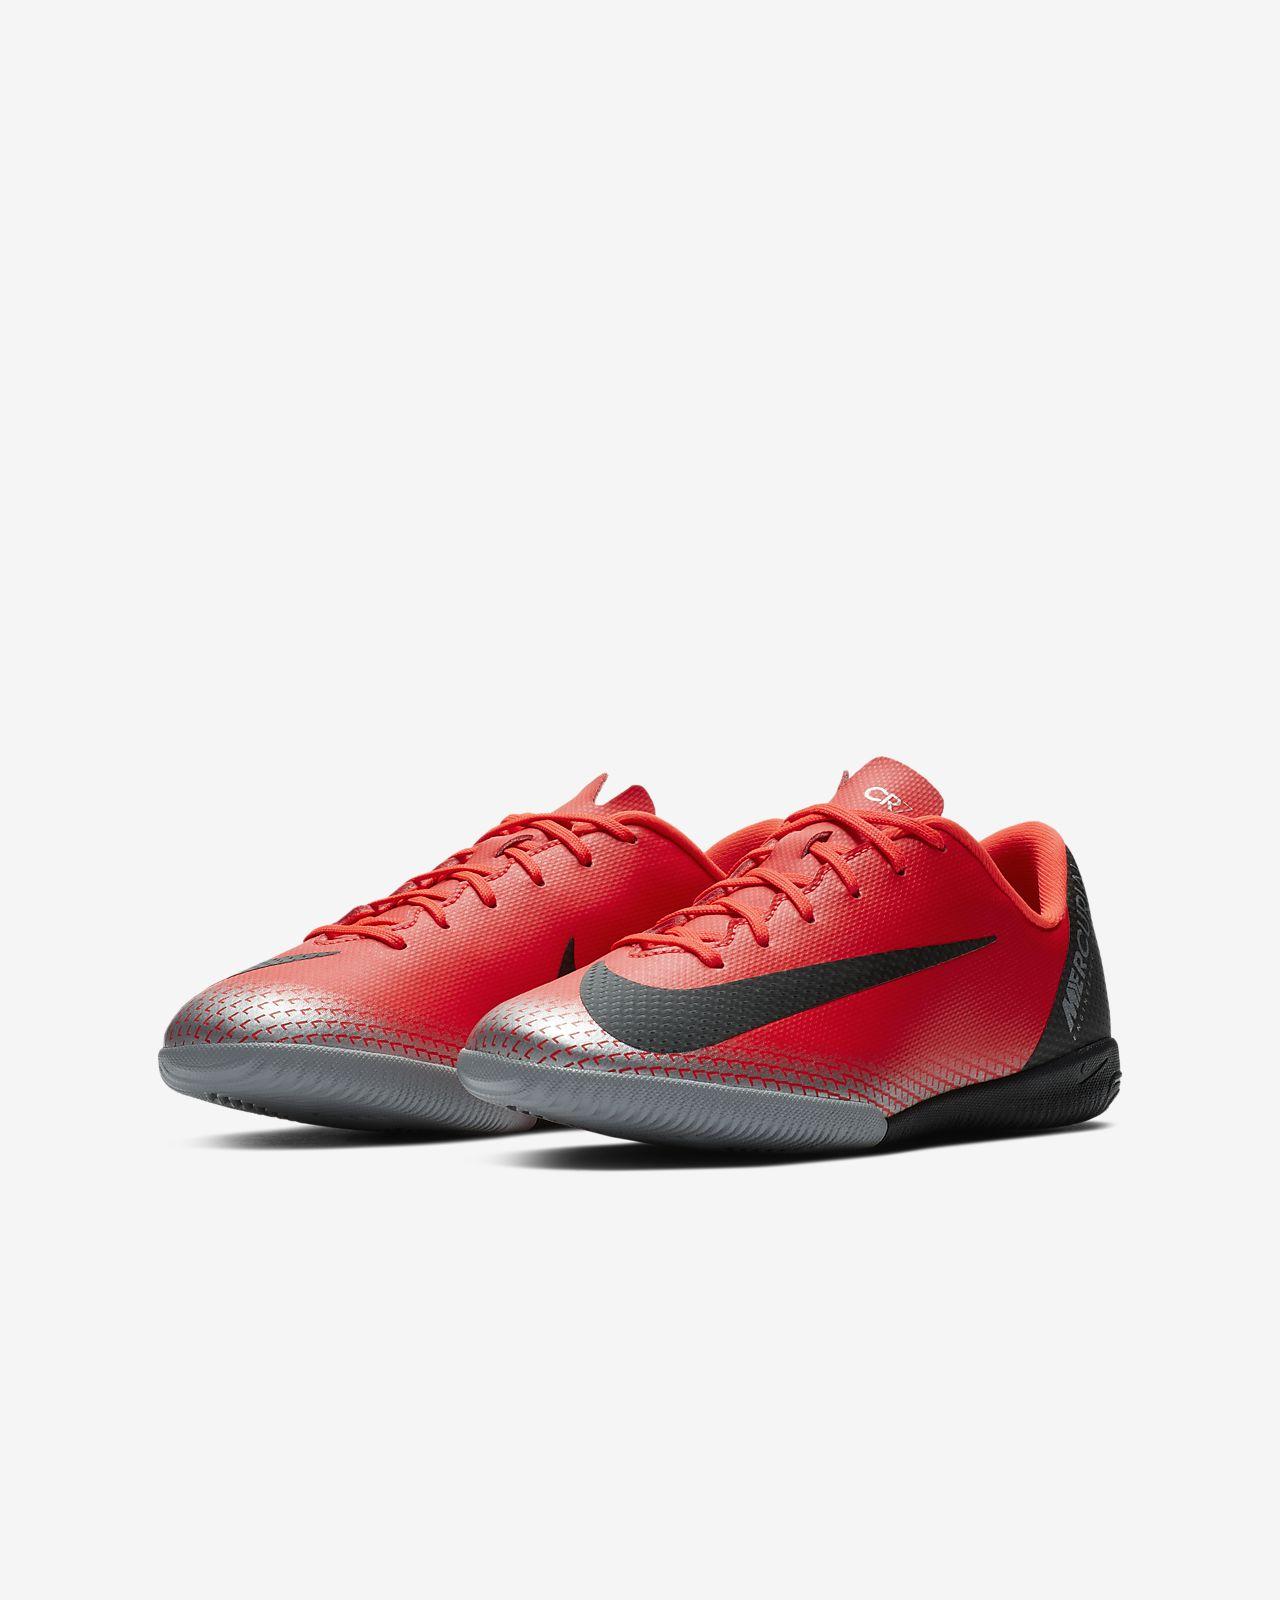 a280264a3 ... Nike Jr. MercurialX Vapor XII Academy CR7 Younger Older Kids  Indoor  Court